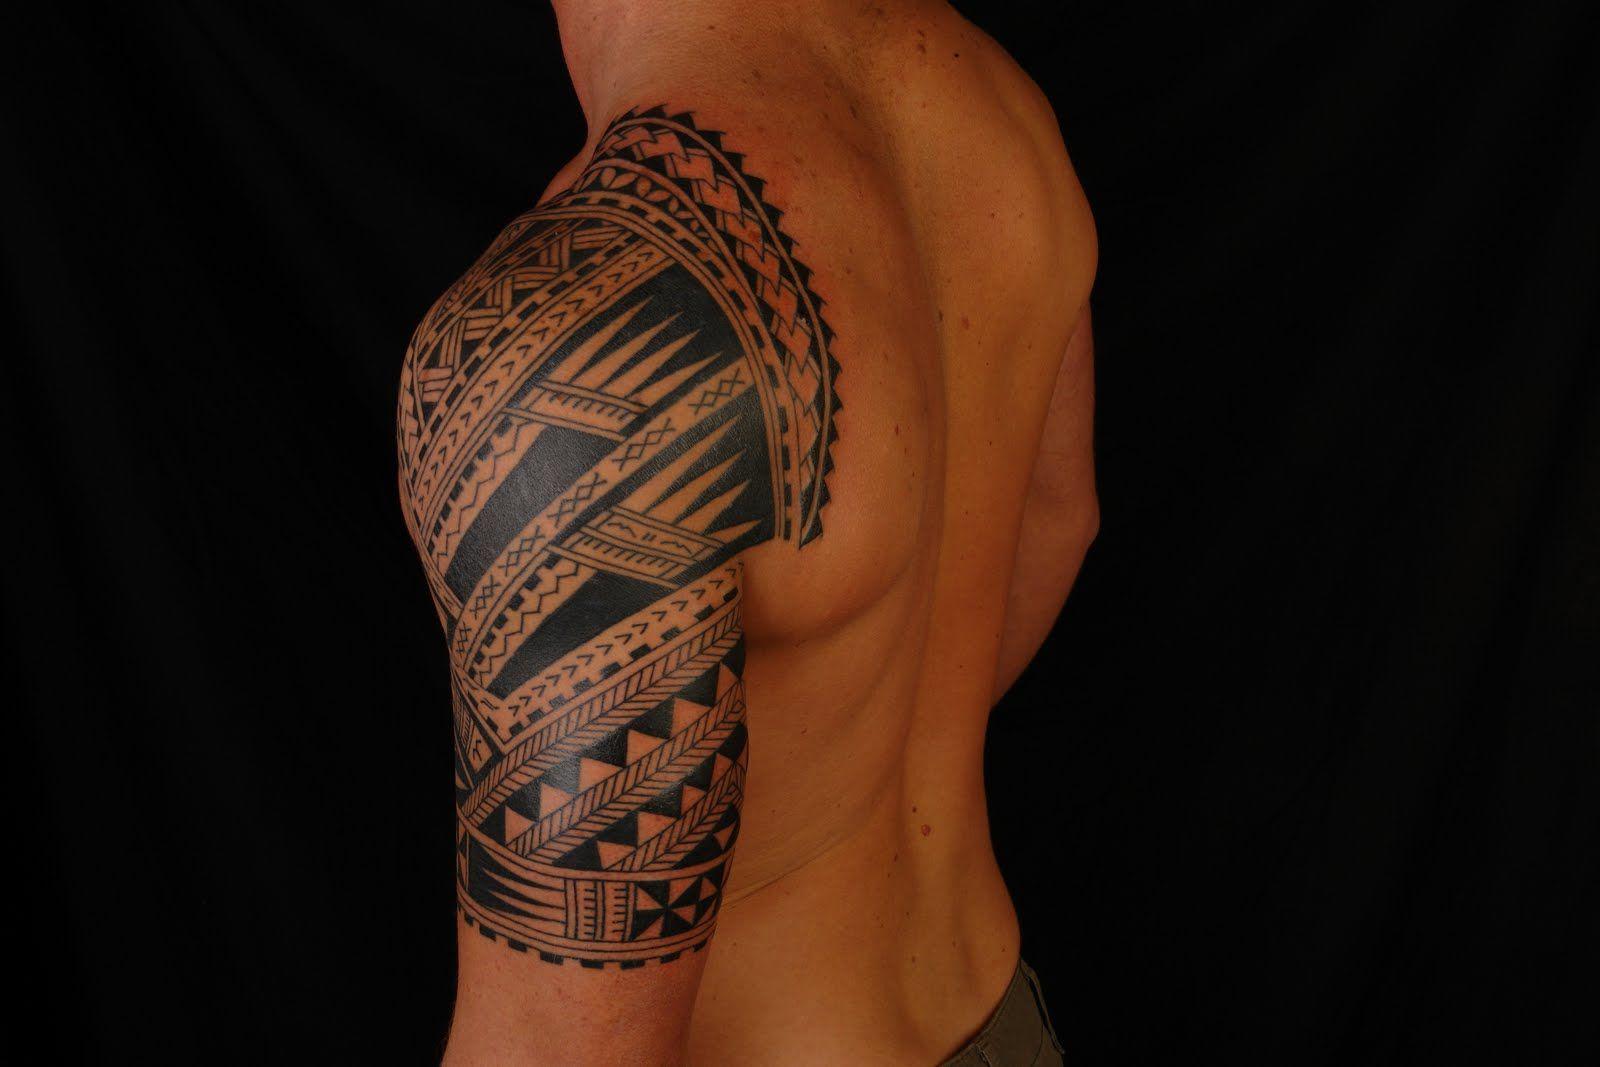 Shane Tattoos Polynesian Half Sleeve On Codie Half Sleeve Tribal Tattoos Half Sleeve Tattoos For Guys Half Sleeve Tattoo